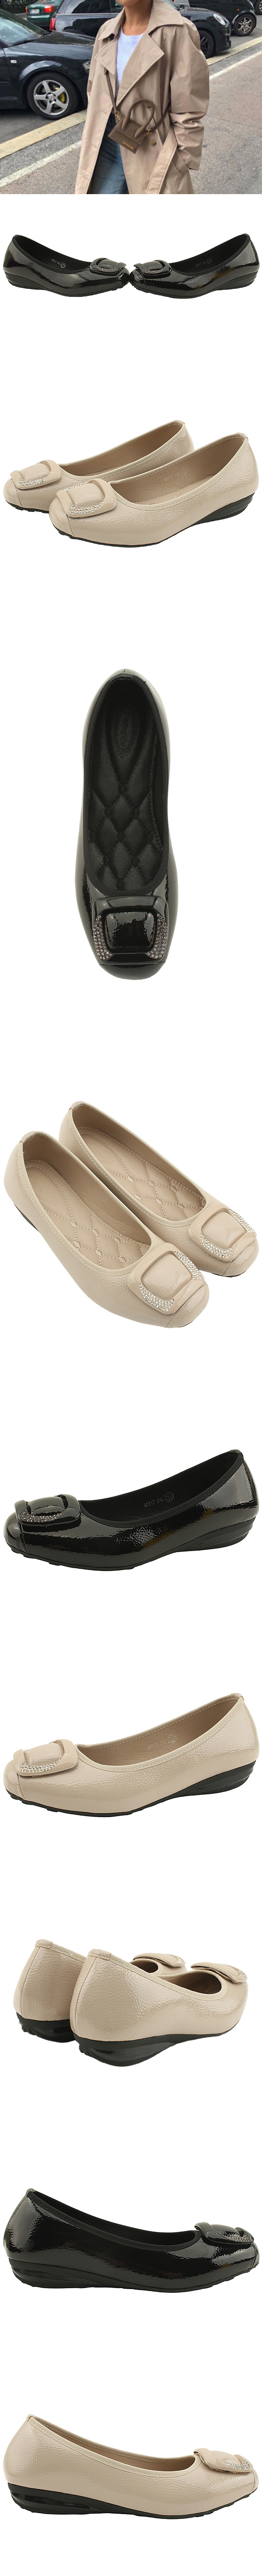 Feminine Cubic Wedge Heel Loafer Shoes Black